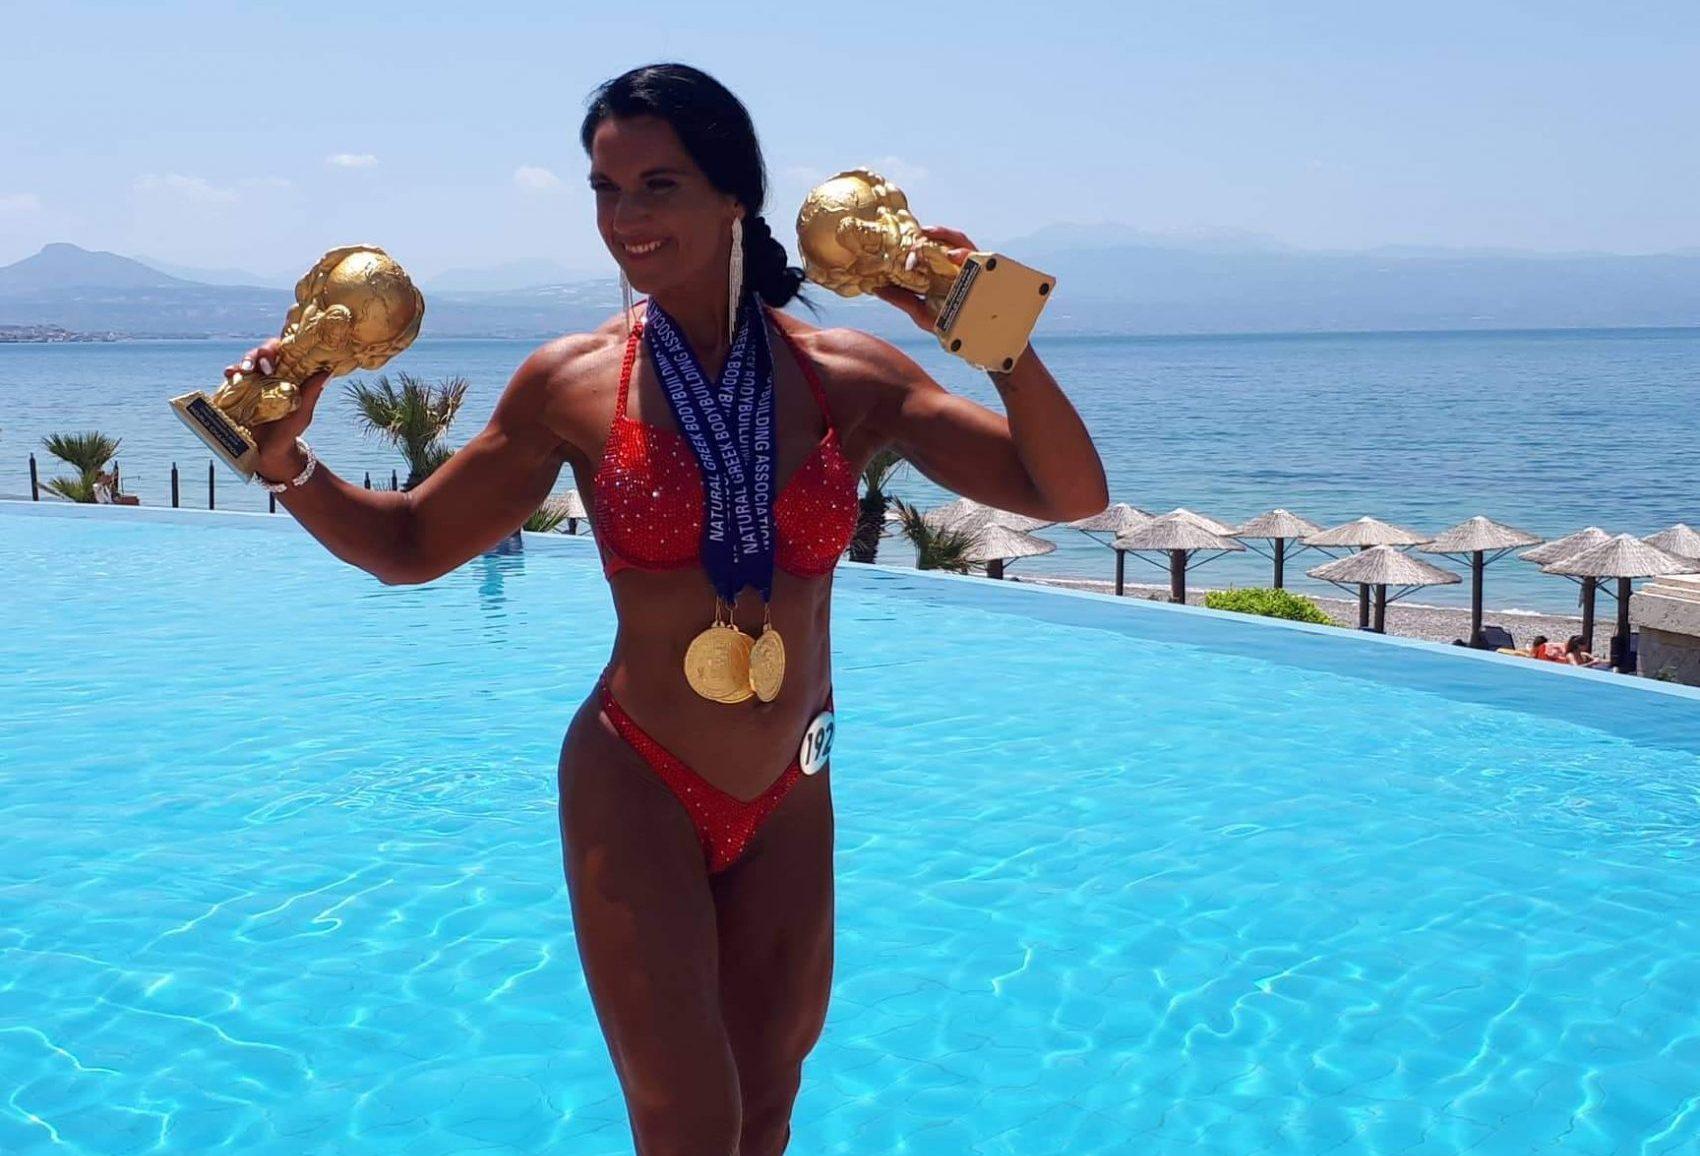 Majstrovstvá sveta stromi medailami